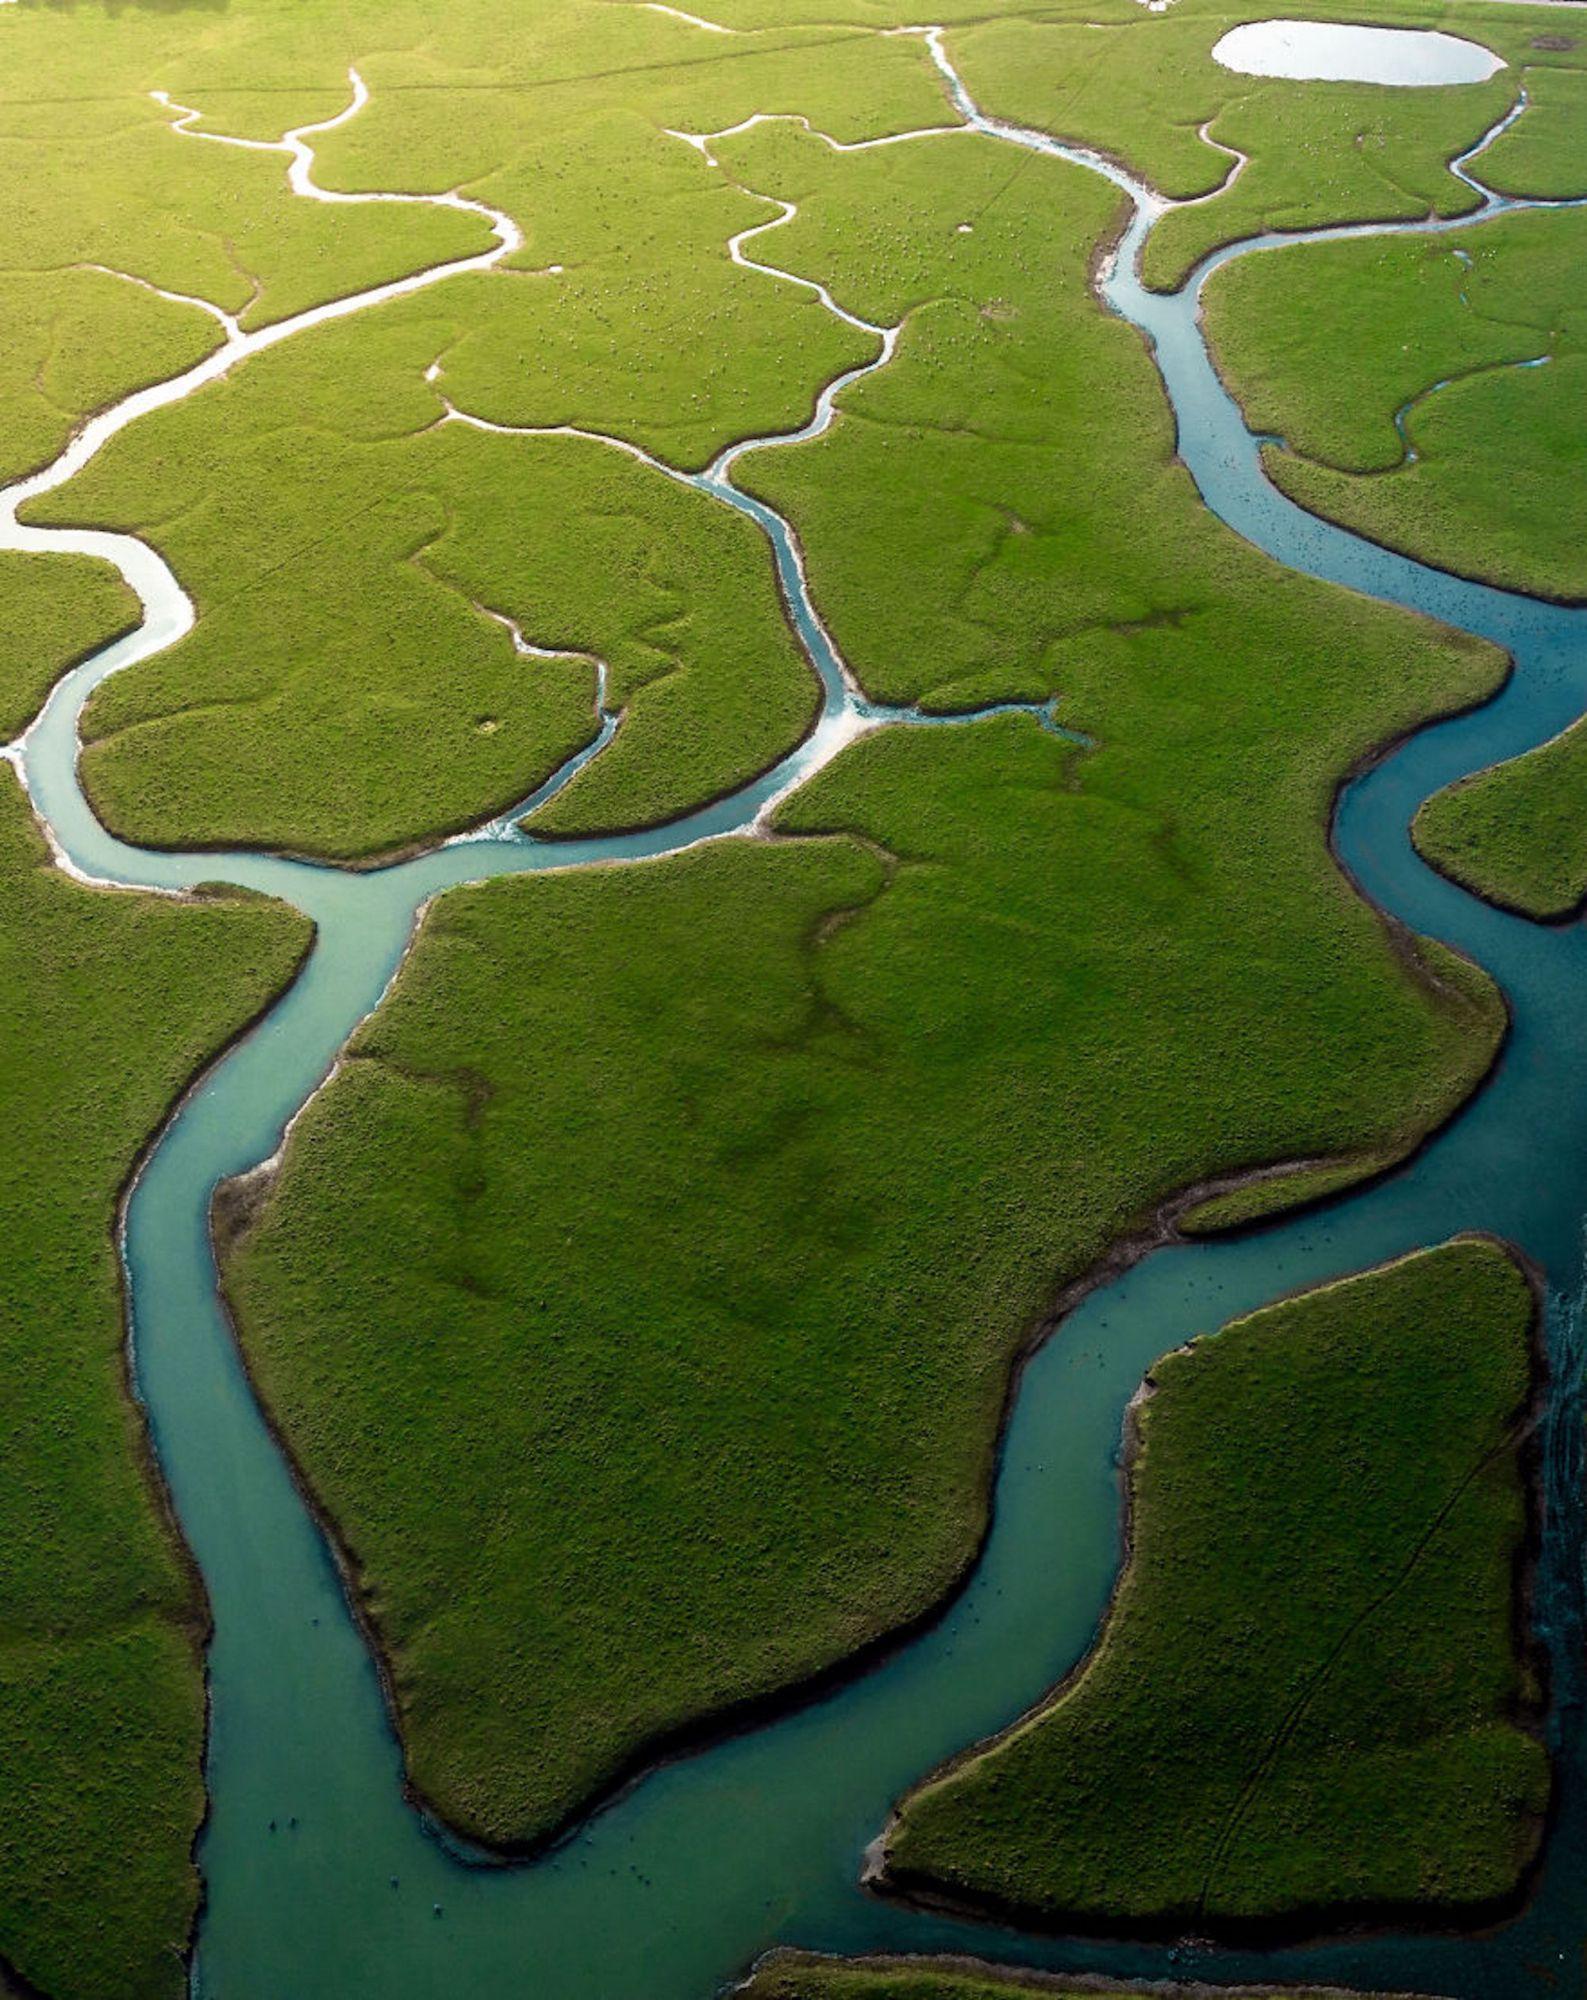 Rio Cuckmere, na Inglaterra, divide as pastagens